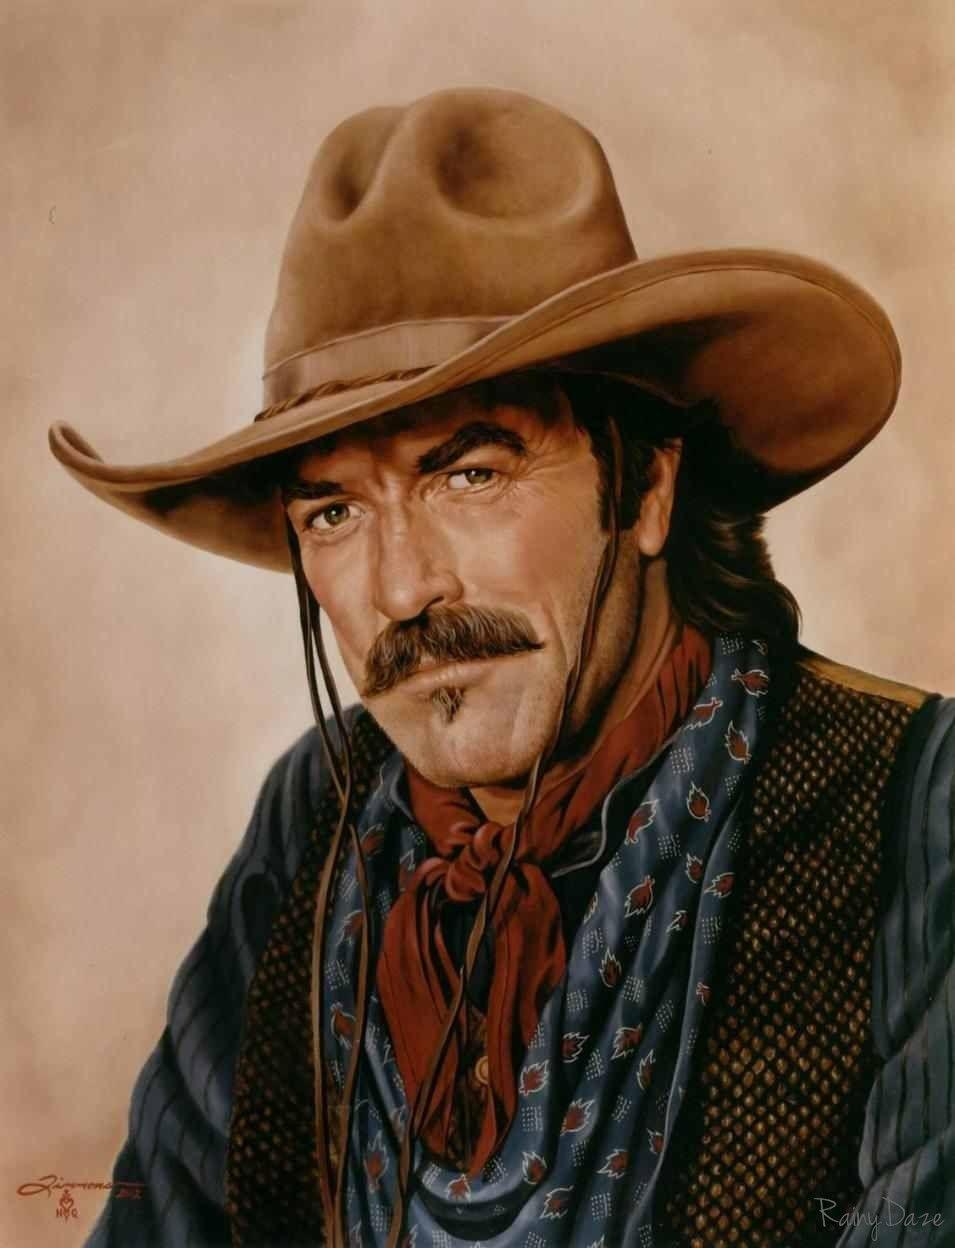 6b72d6a7f625d Estern Cowboy Hat Movie Prop Gre See Clint Eastwood Filming ...